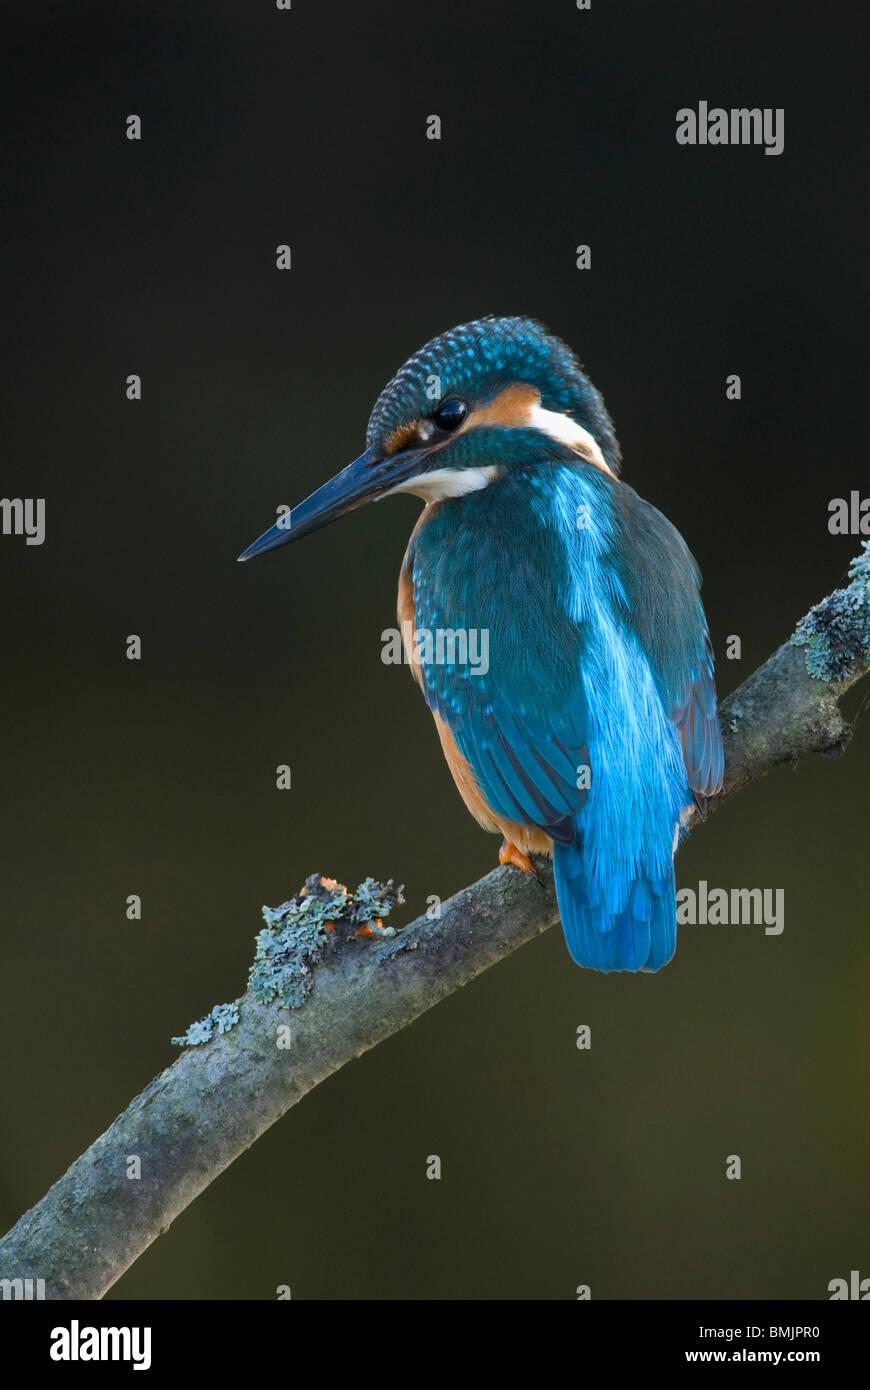 Scandinavia, Sweden, Smaland, Kingfisher bird perching on branch, close-up - Stock Image